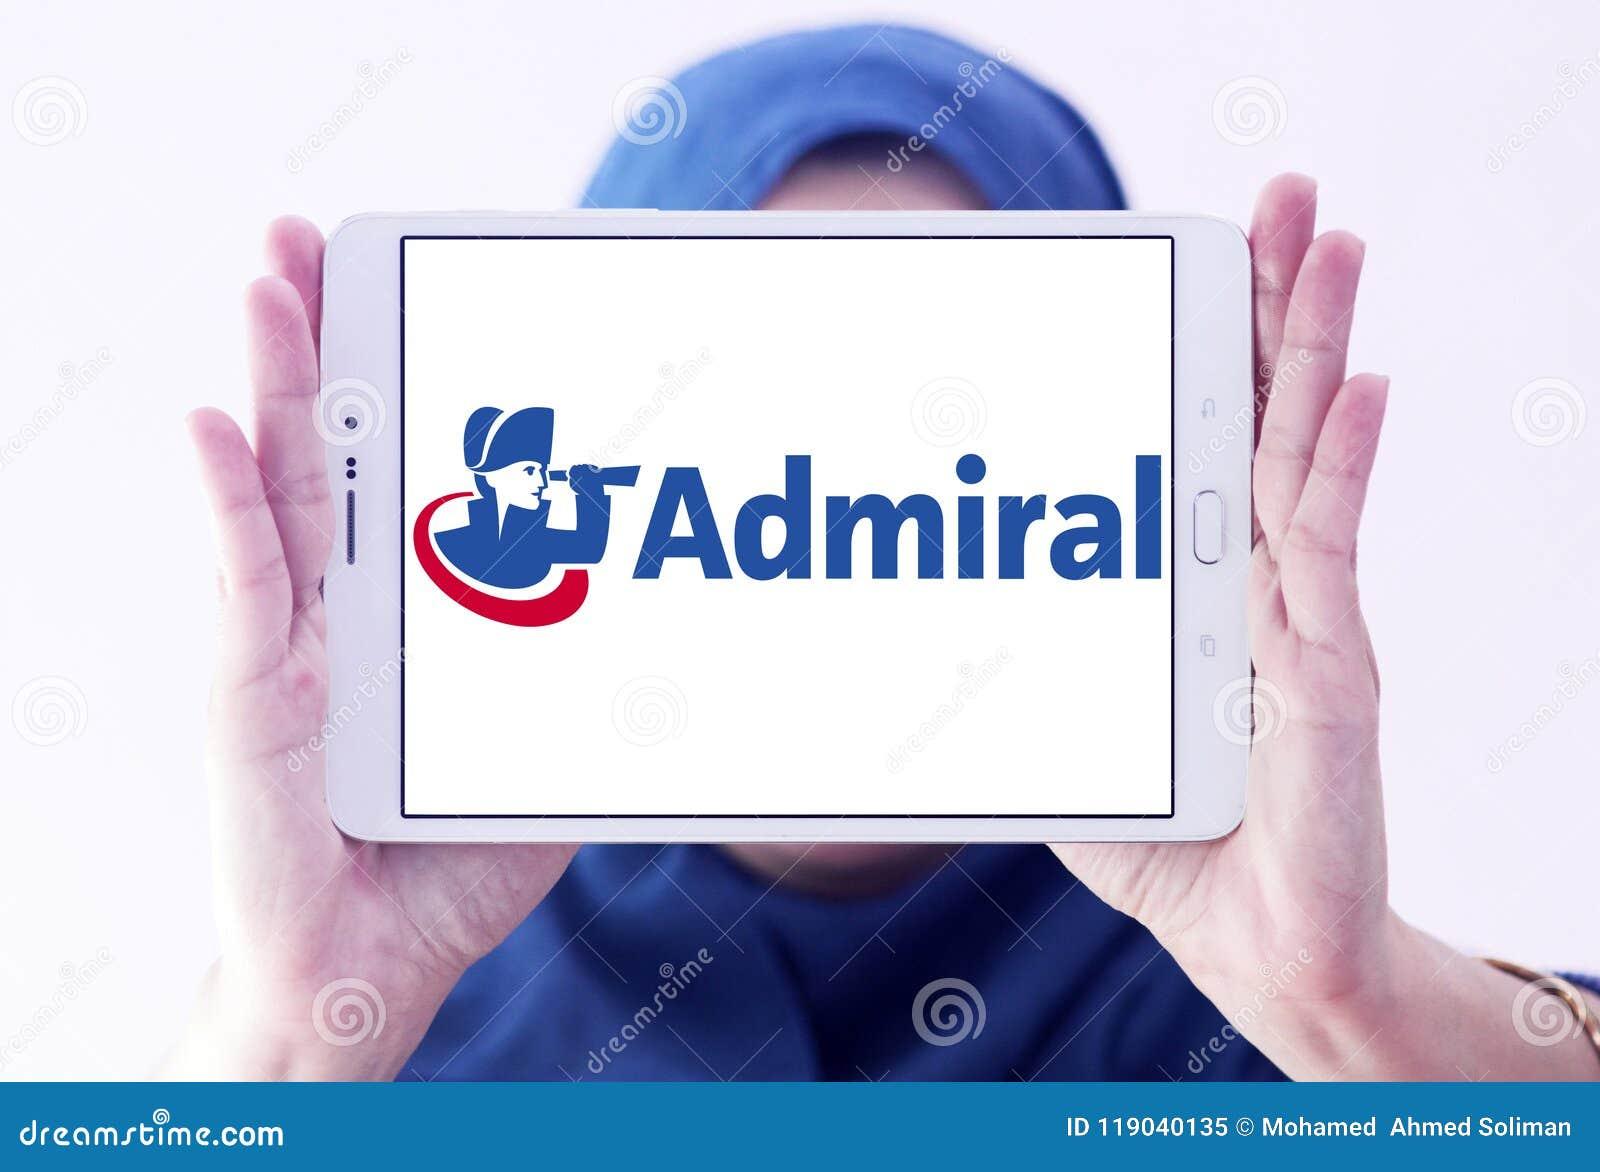 Admiral Car Insurance >> Admiral Insurance Company Logo Editorial Image Image Of